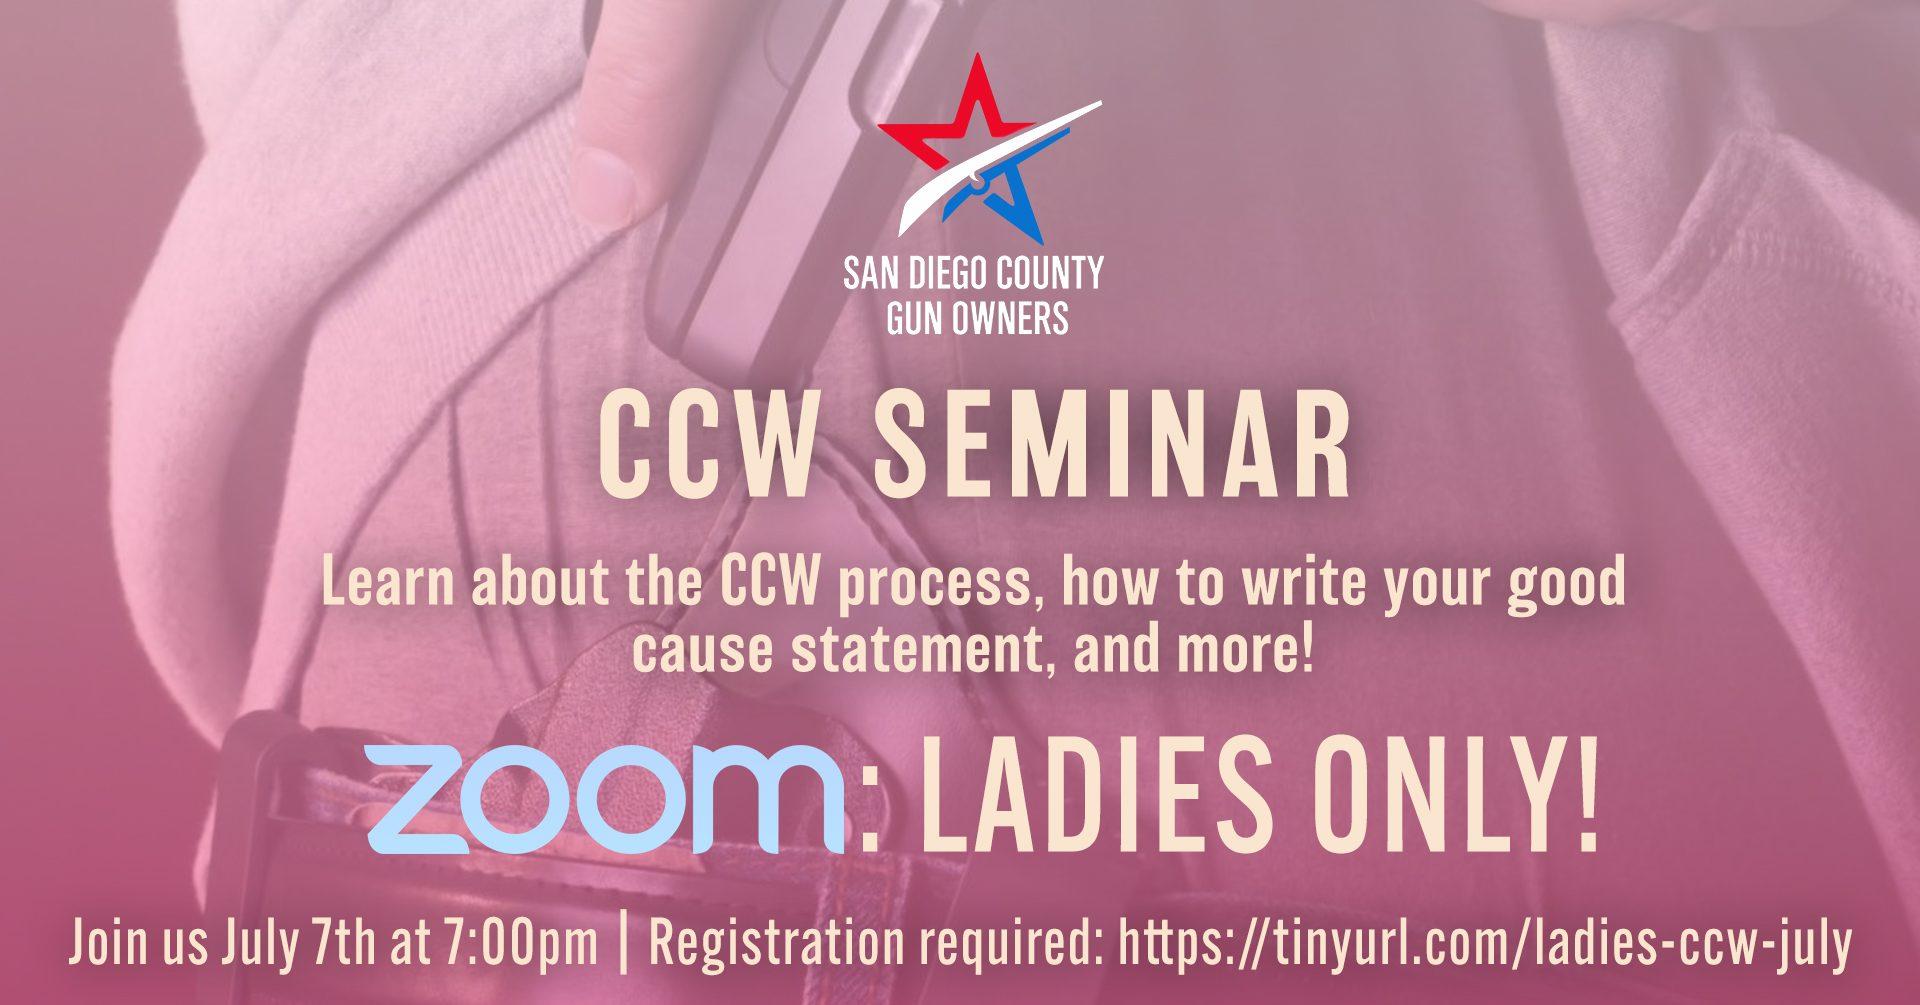 SD_CCW_July_Ladies2